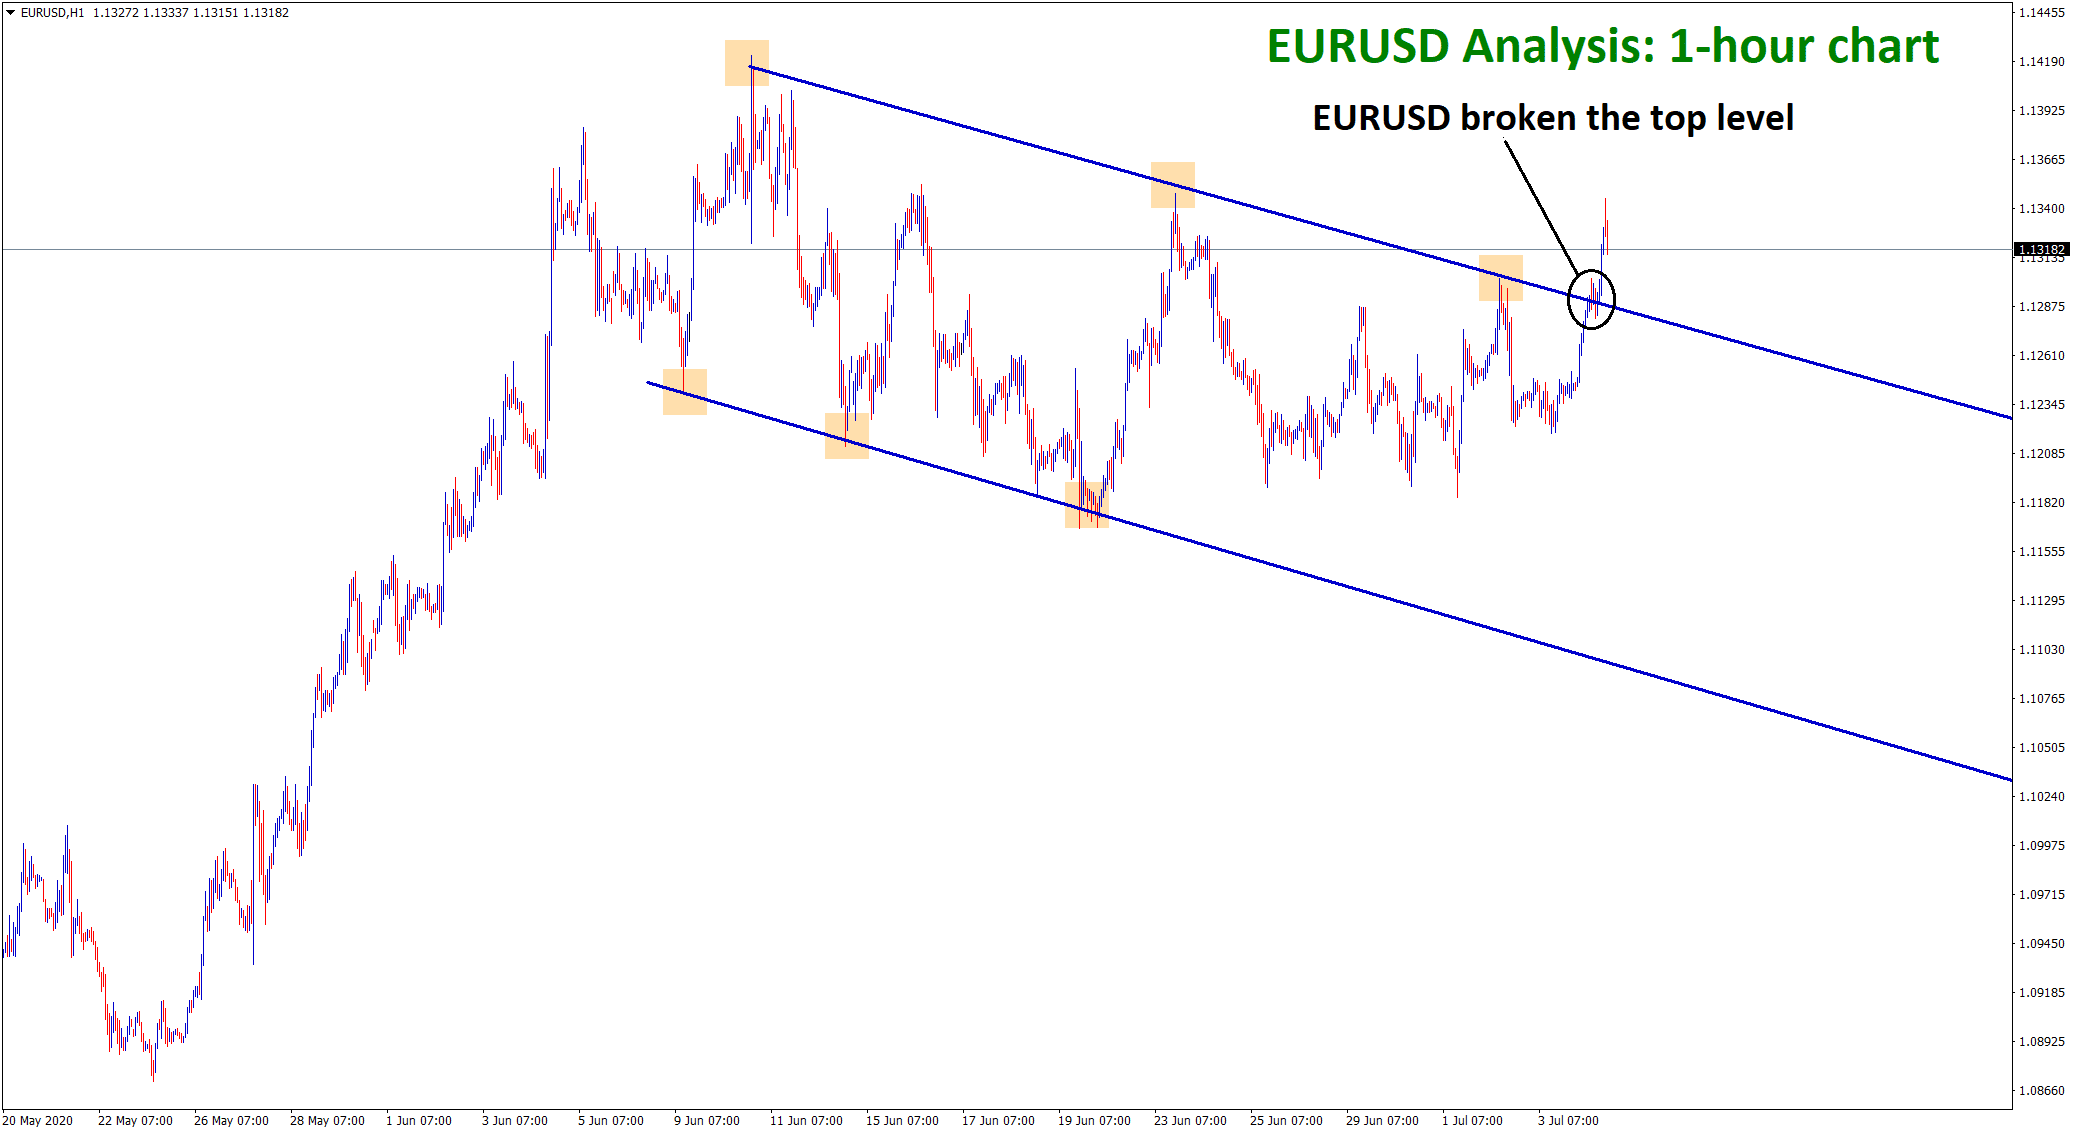 EURUSD broken the top level of the flag in uptrend